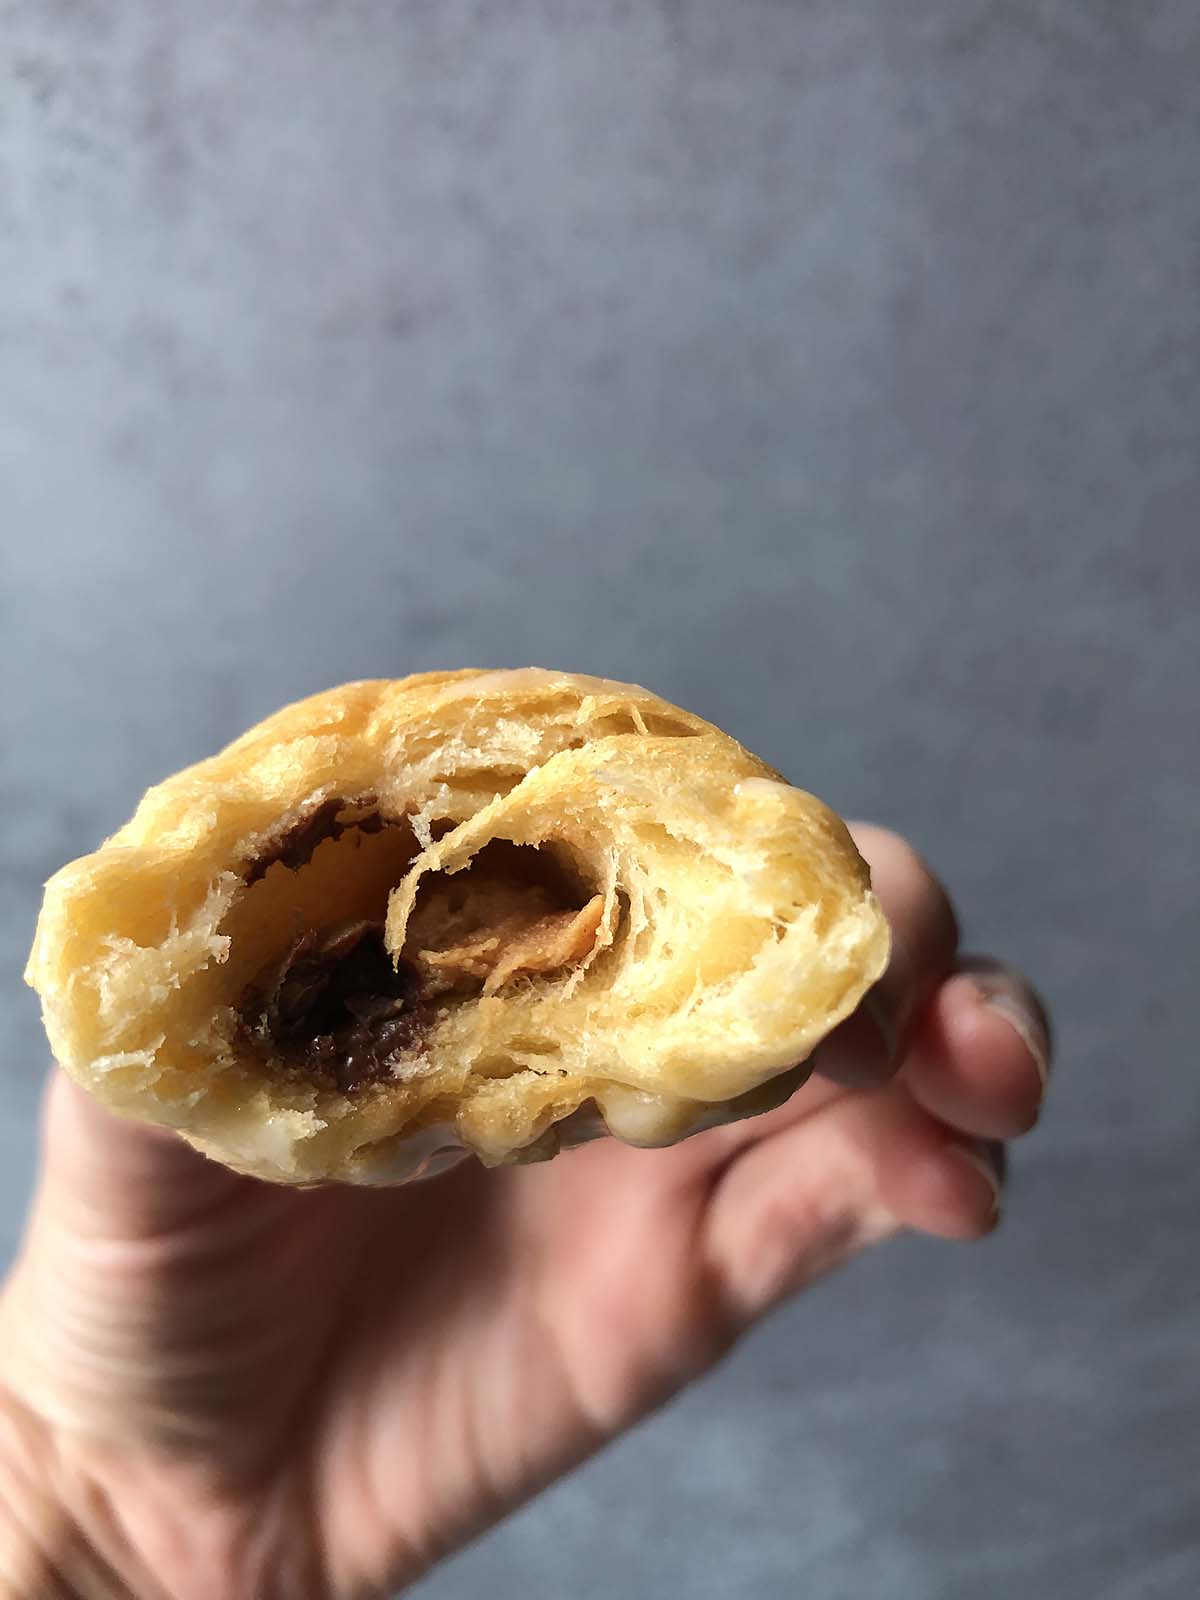 a half-eaten peanut butter chocolate croissant